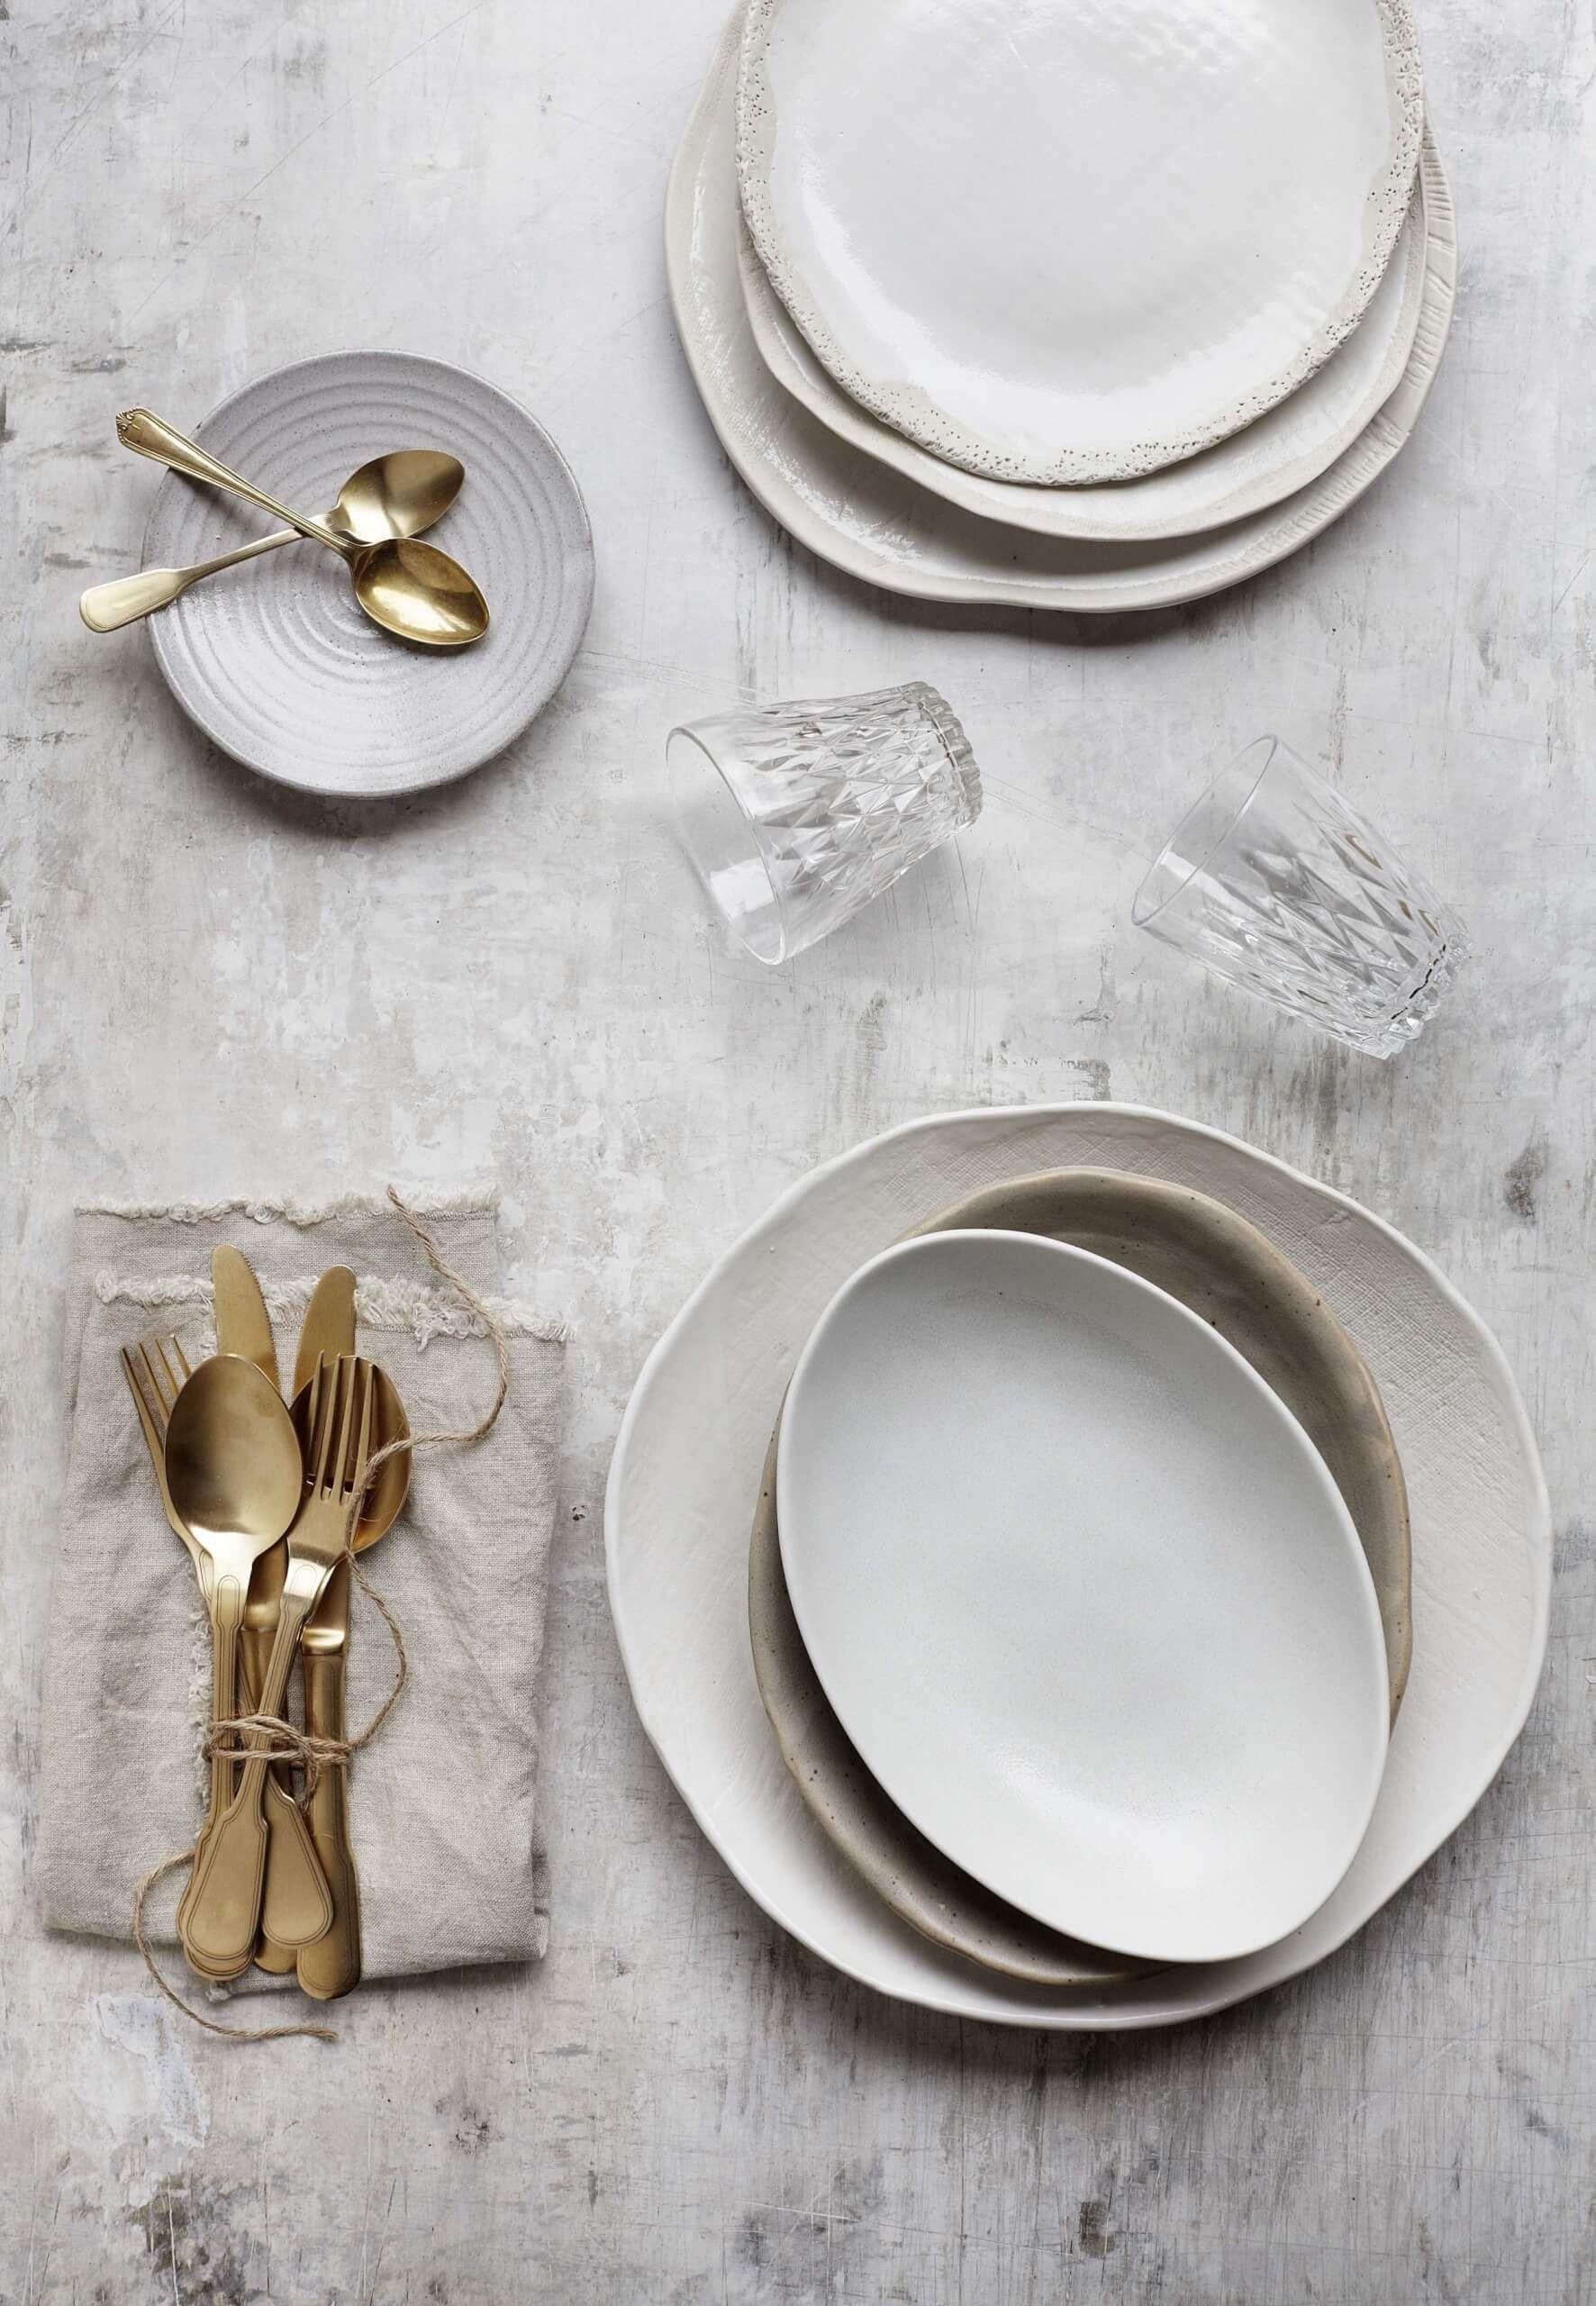 Modern Scandinavian Table Settings We Love Nonagon Style Scandinavian Table Food Photography Props Dinnerware